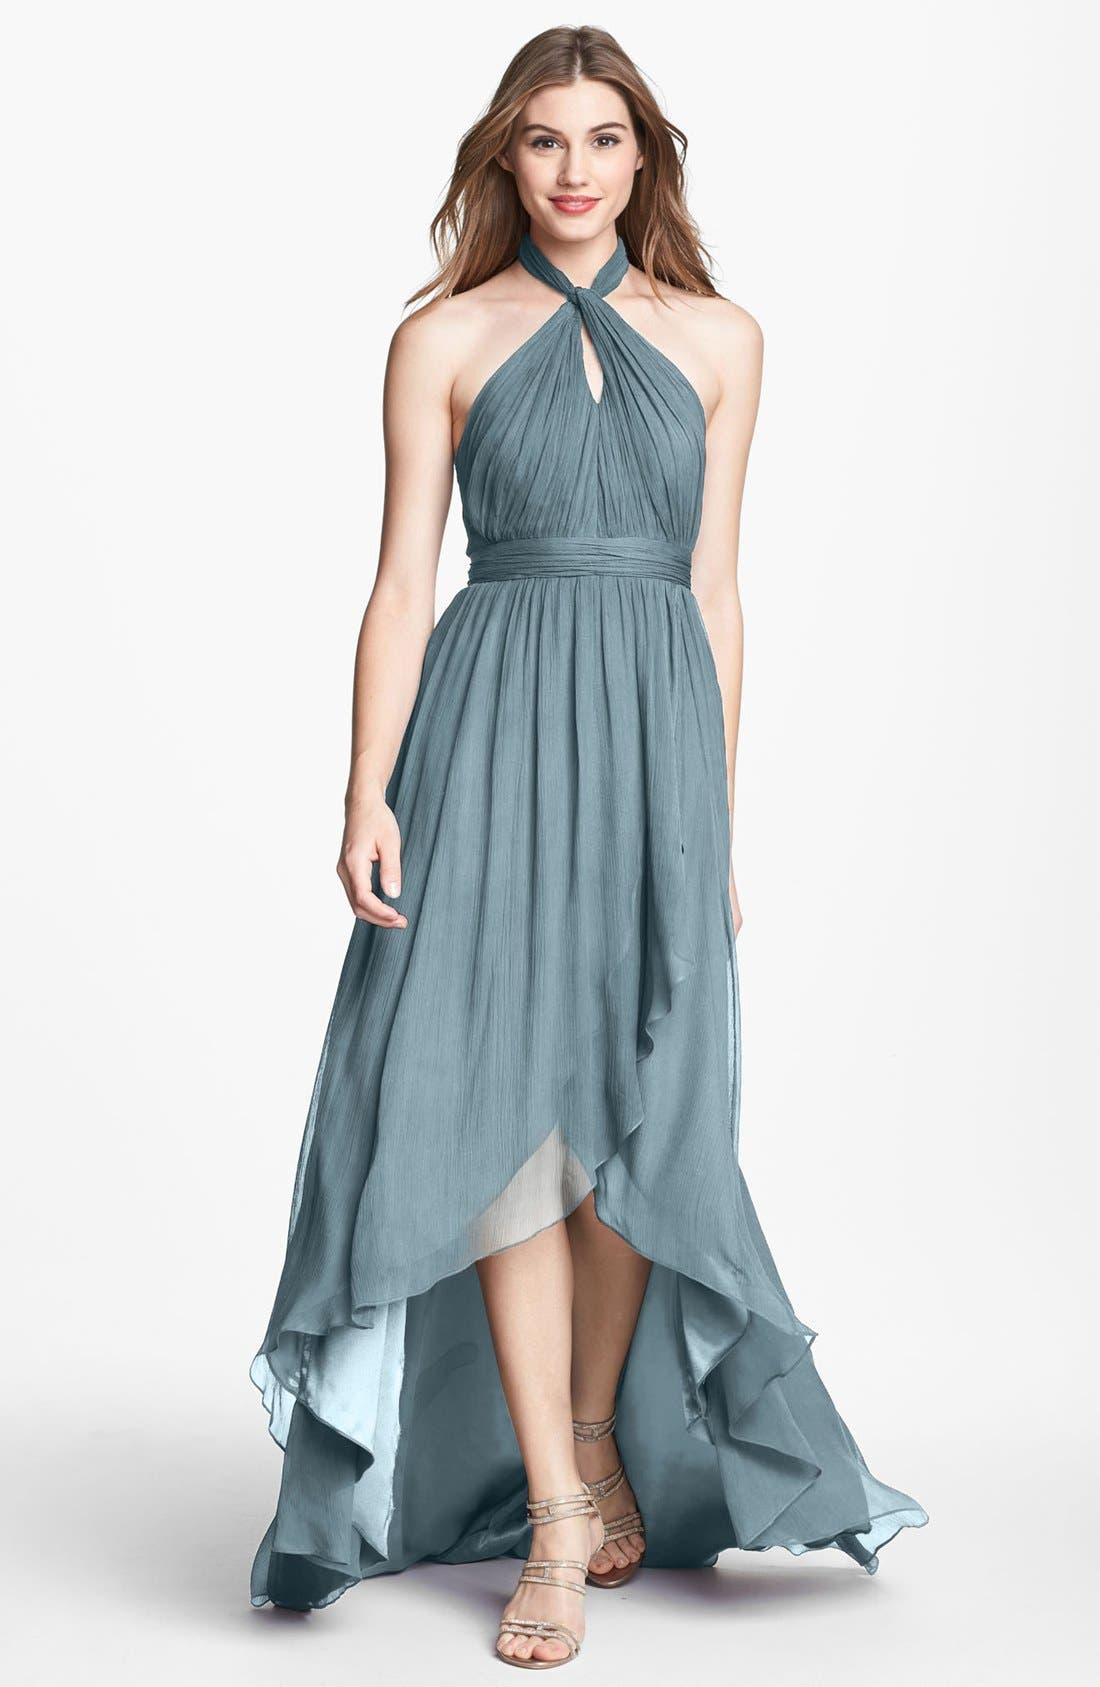 Alternate Image 1 Selected - Jenny Yoo 'Olivia' Crinkled Chiffon High/Low Halter Dress (Online Only)